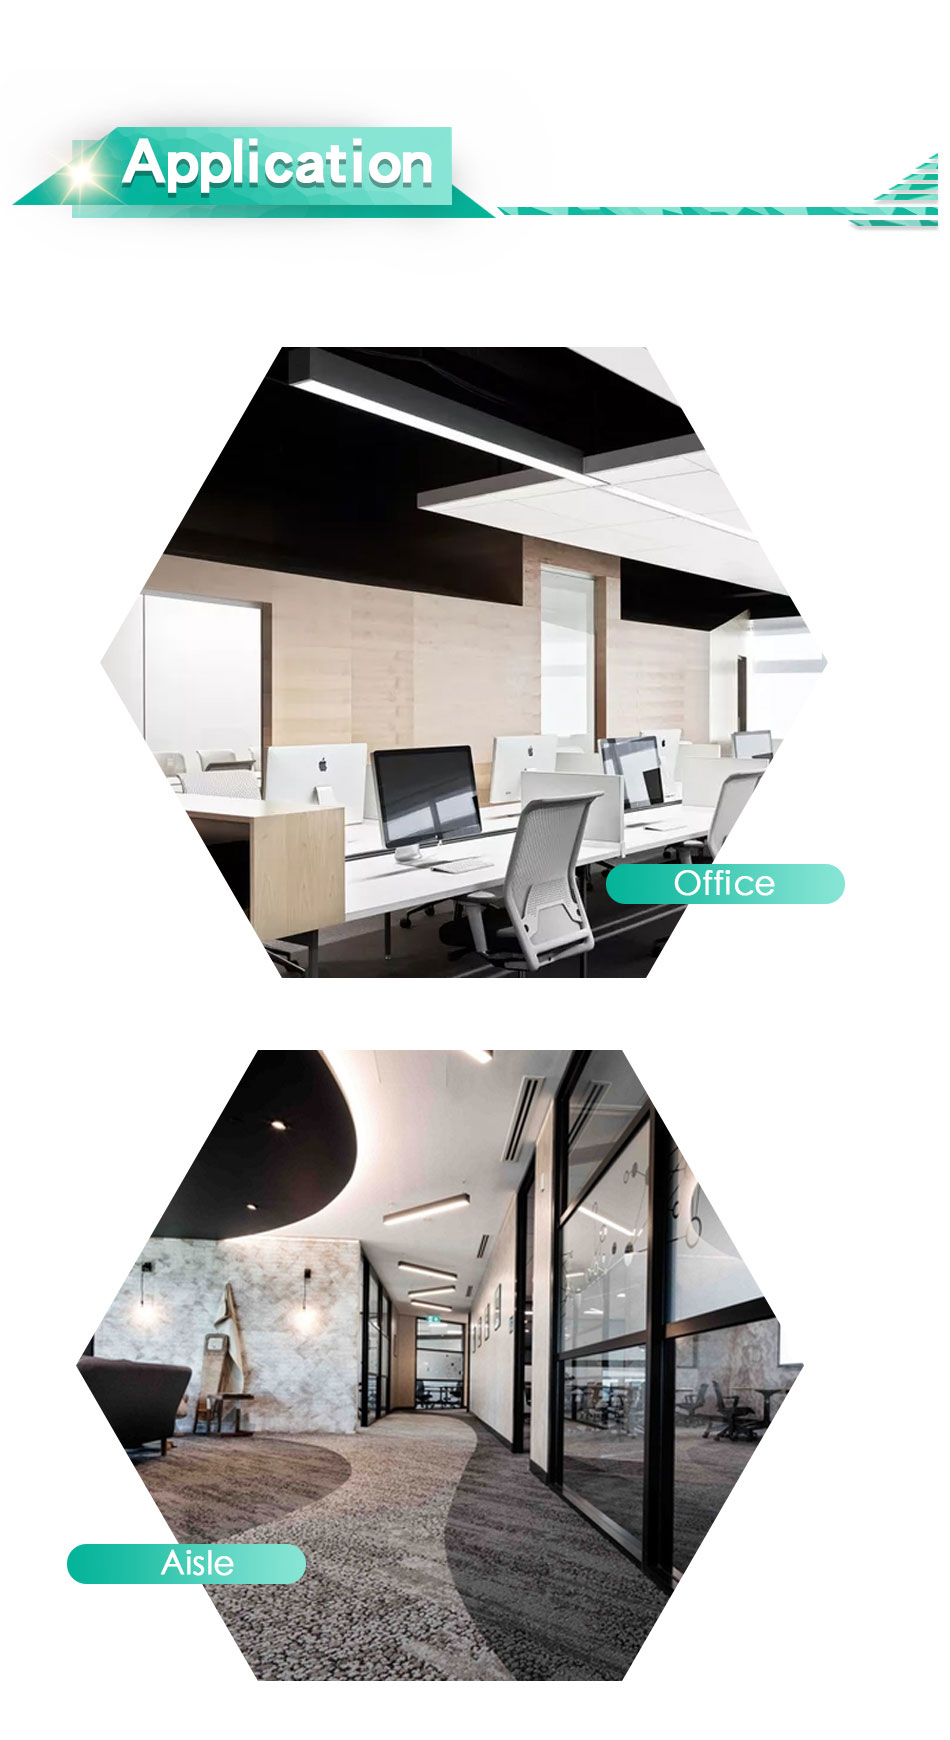 Hd17157f9402b414baa376a4757e00f92L Modern LED Ceiling Light Lamp Lighting Fixture Rectangle Office Remote Bedroom Surface Mount Living Room Panel Control 110V 220V